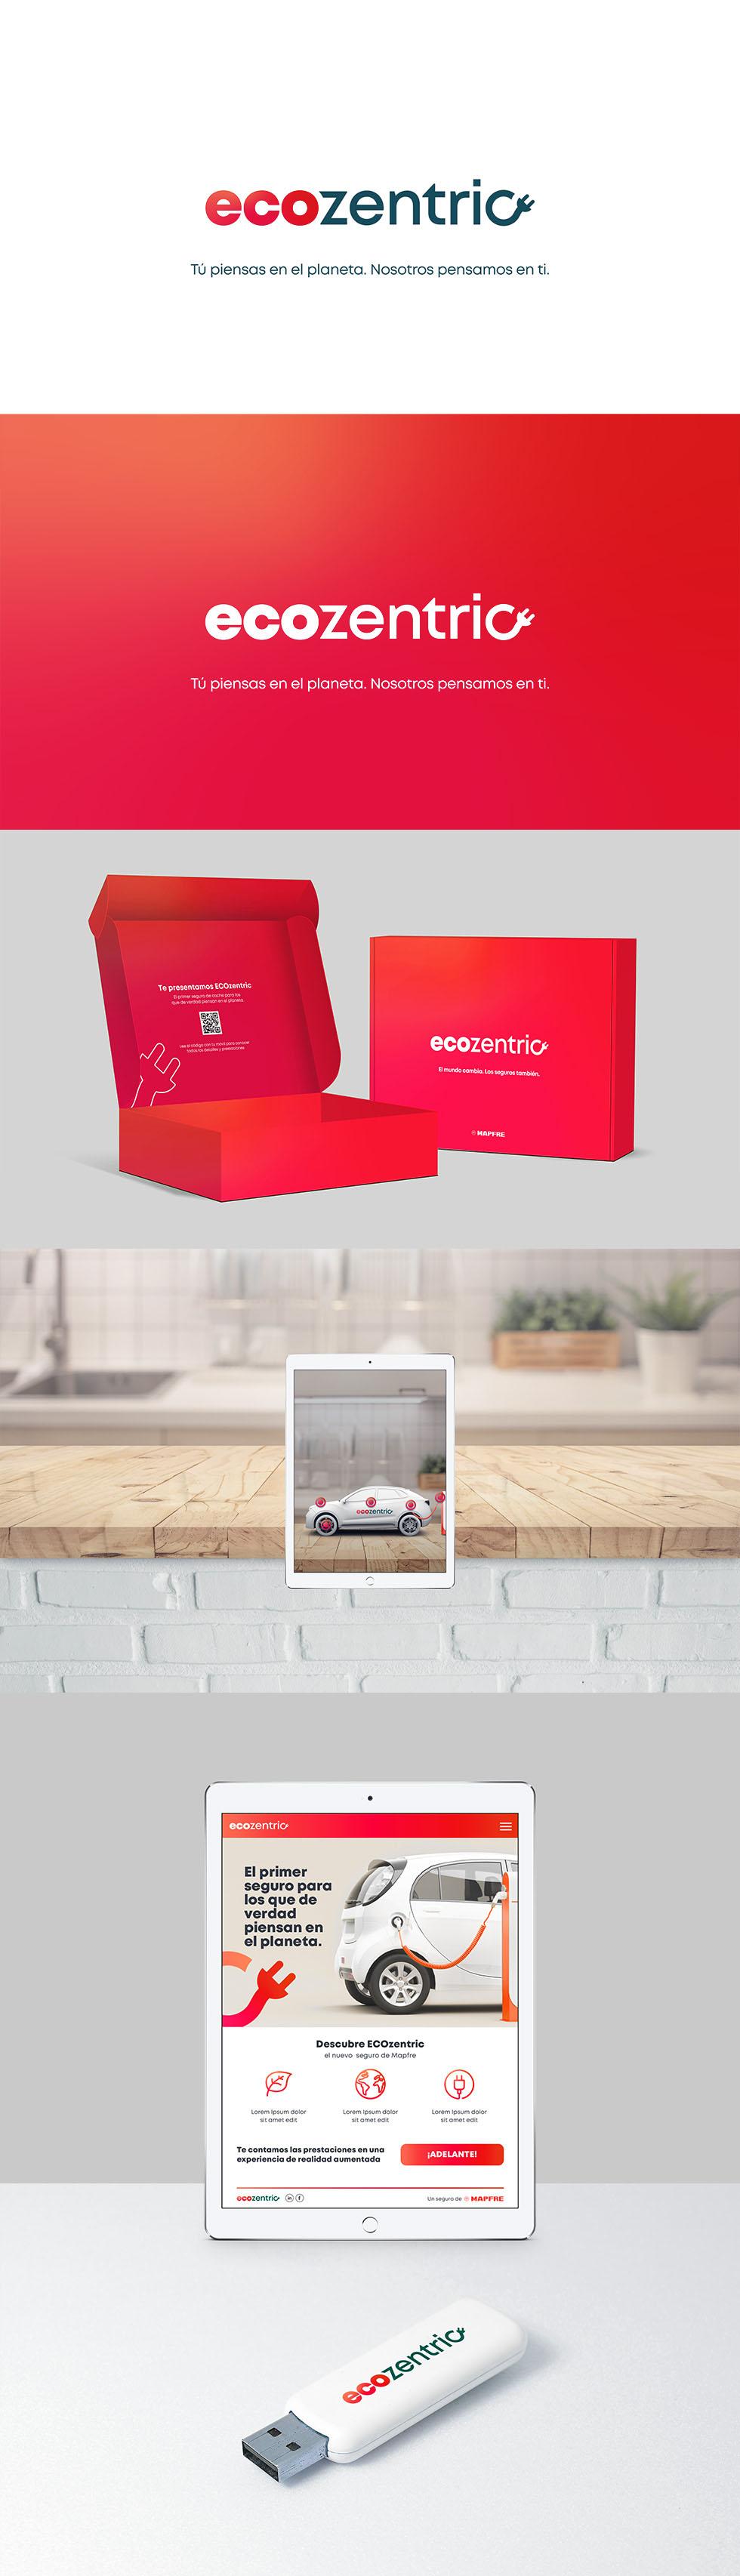 page-mockup-branding-ecozentric